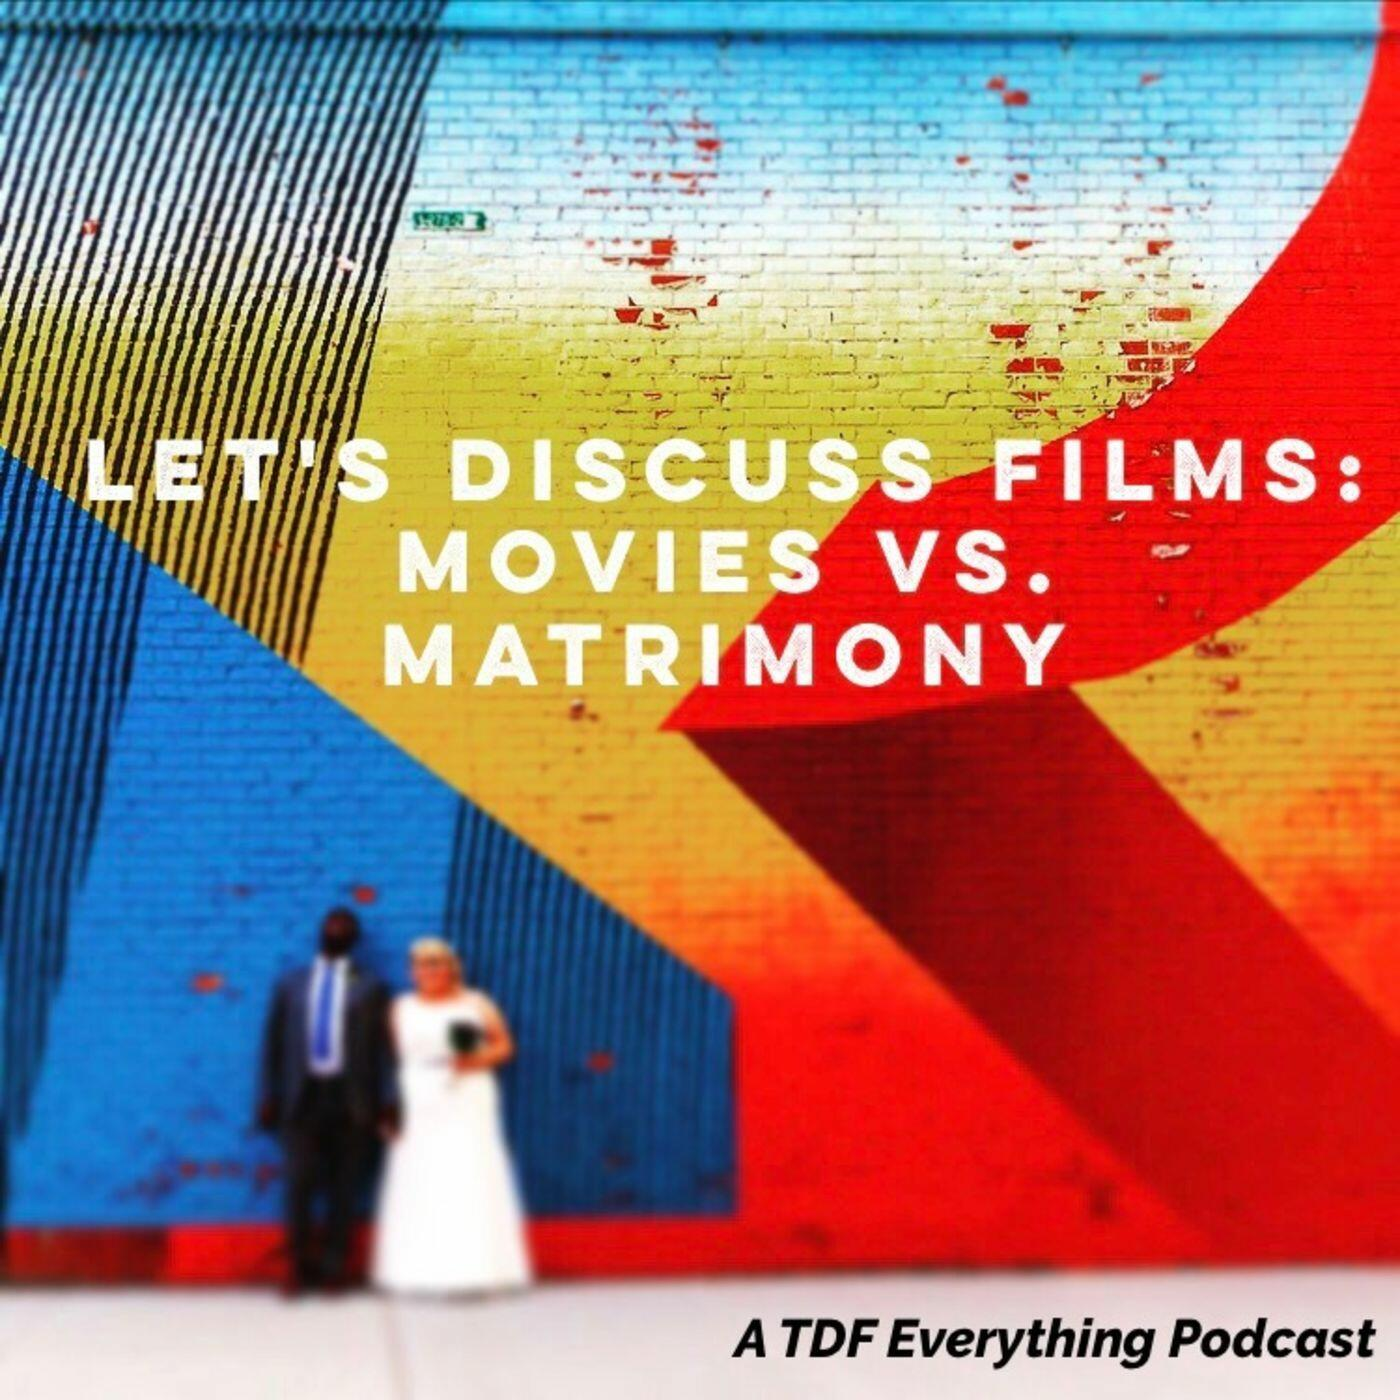 Movies vs. Matrimony